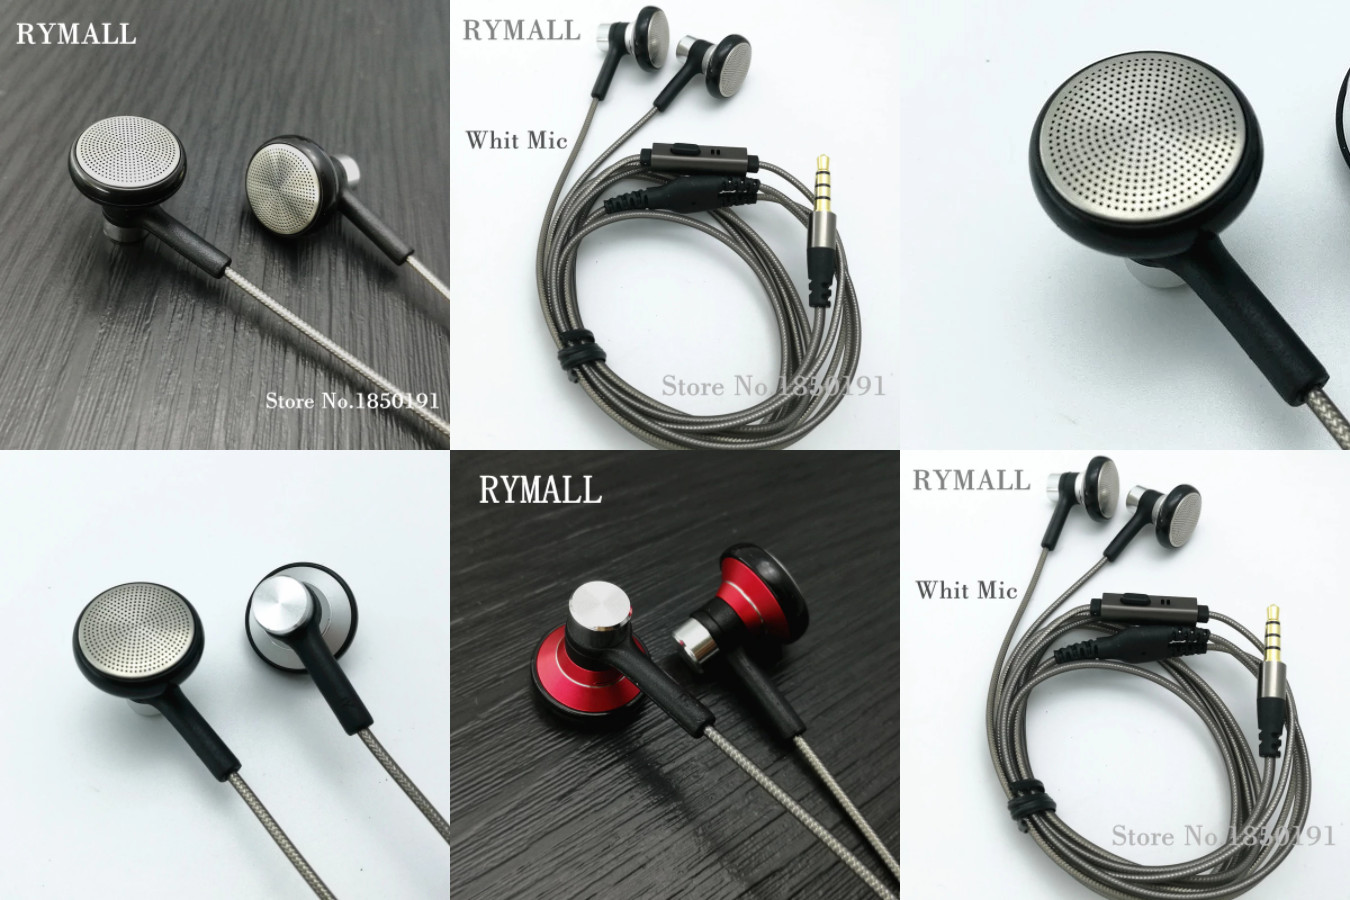 Вкладыши с микрофоном — RYMALL RY04